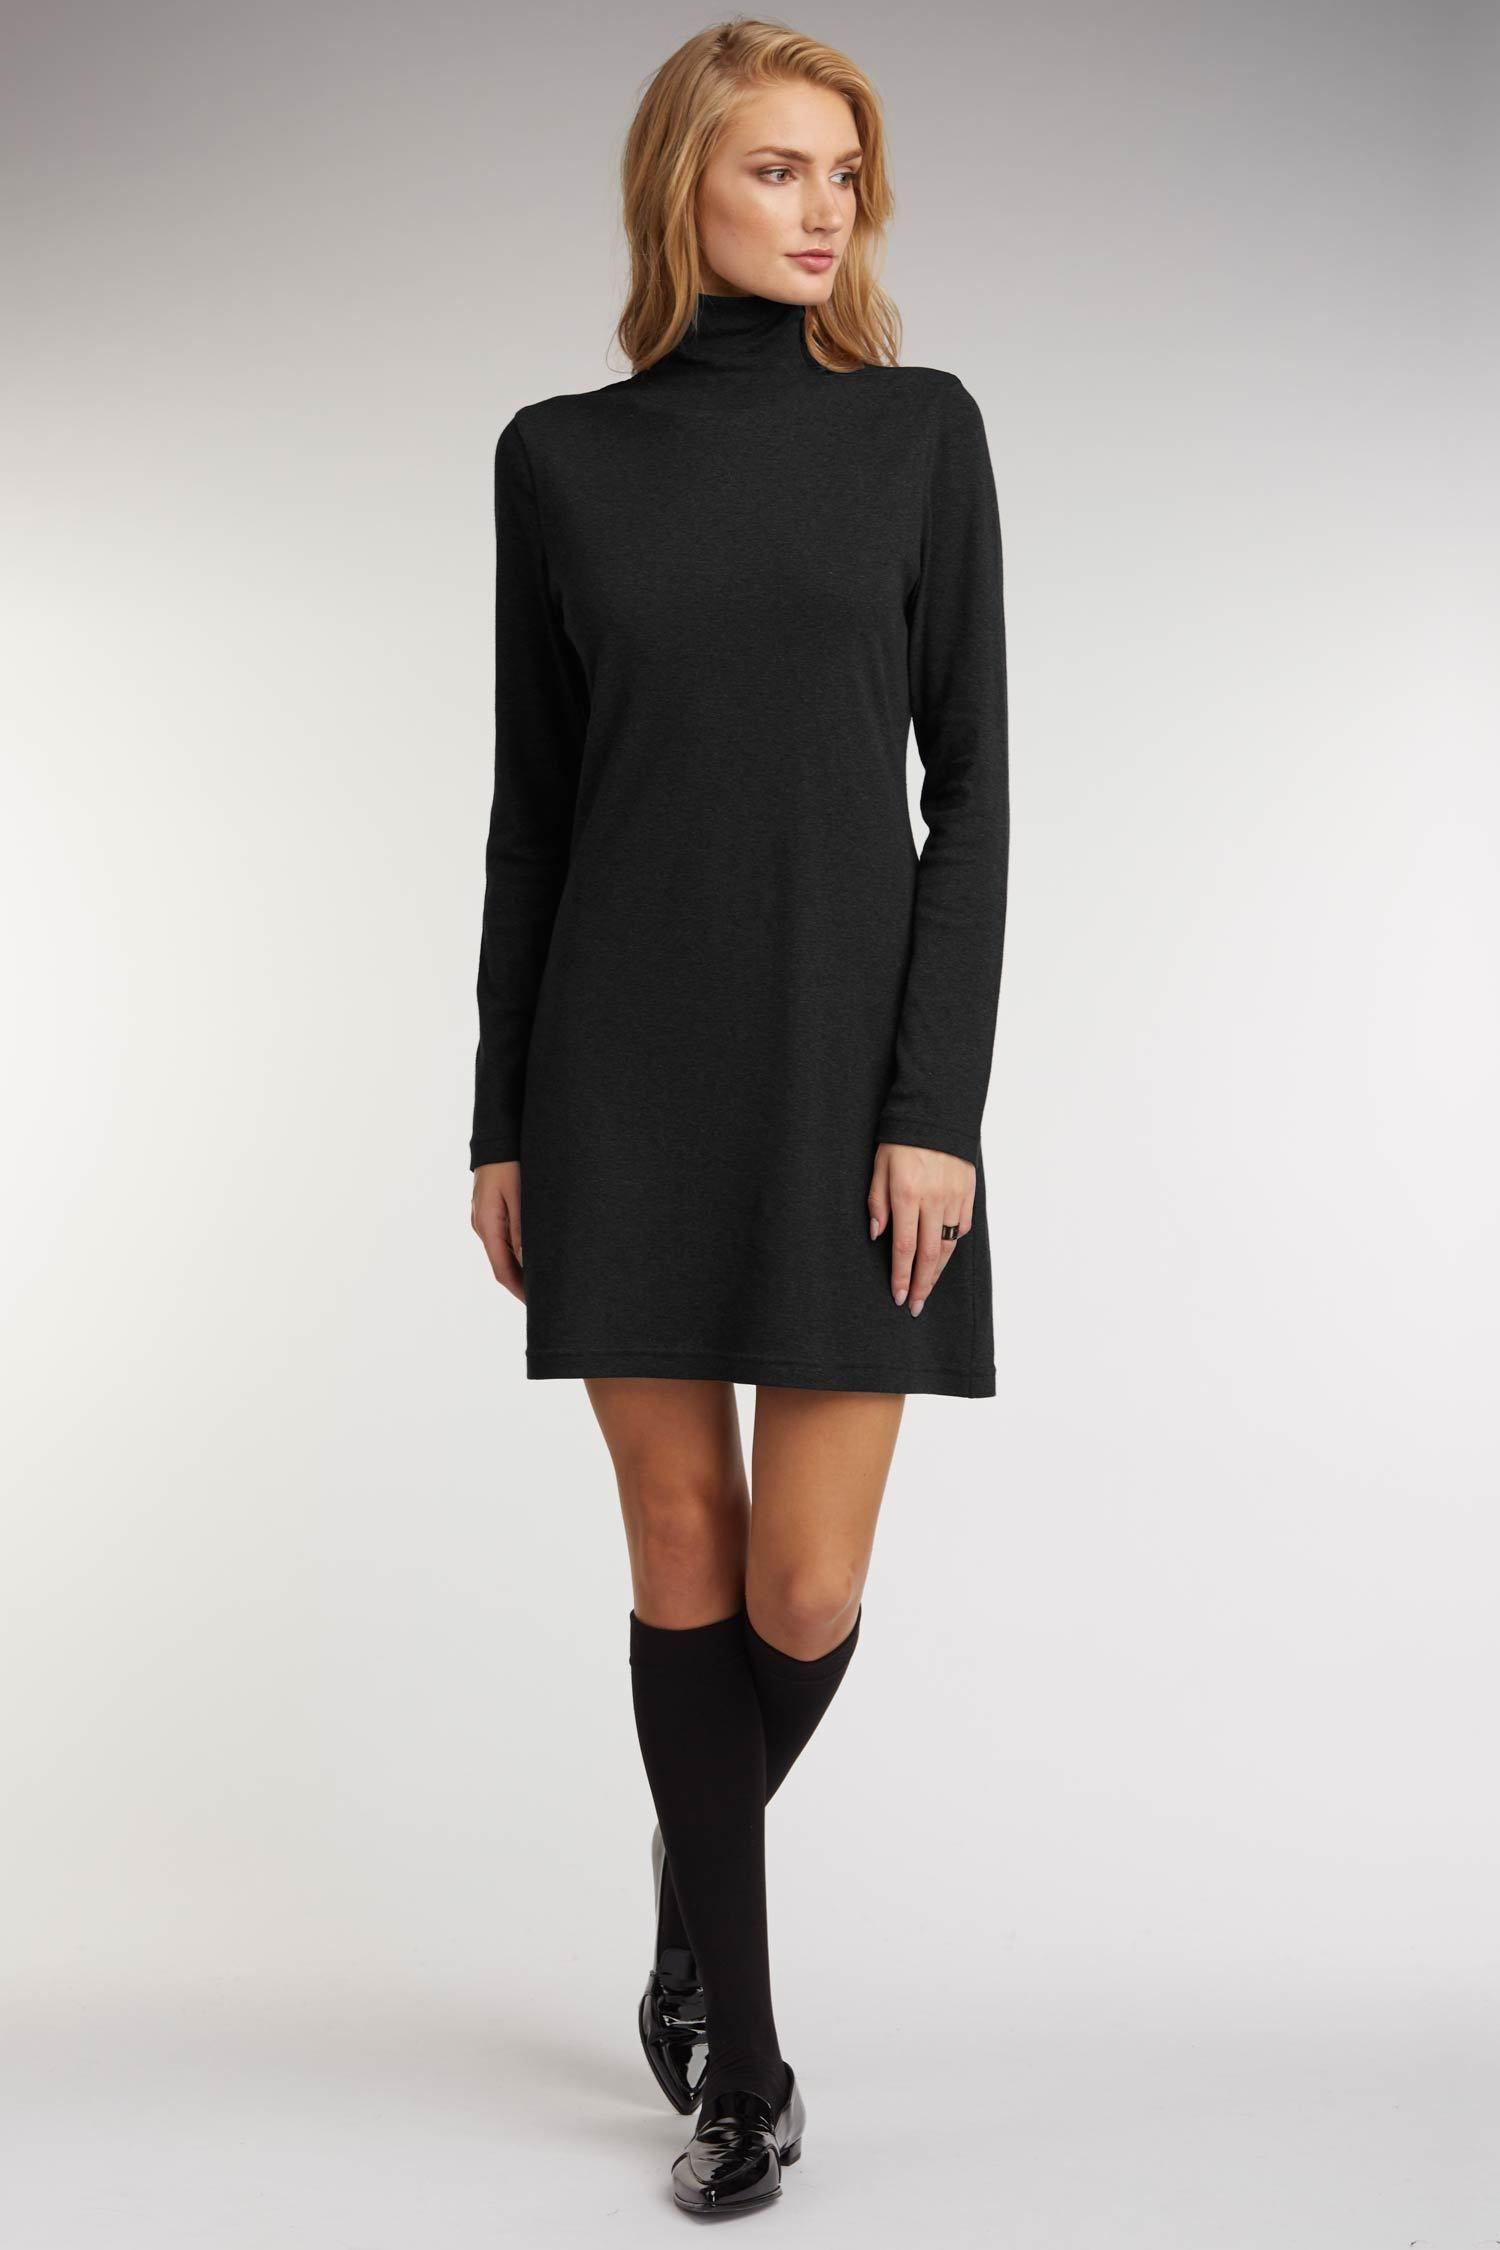 Turtleneck dress turtleneck dress and products